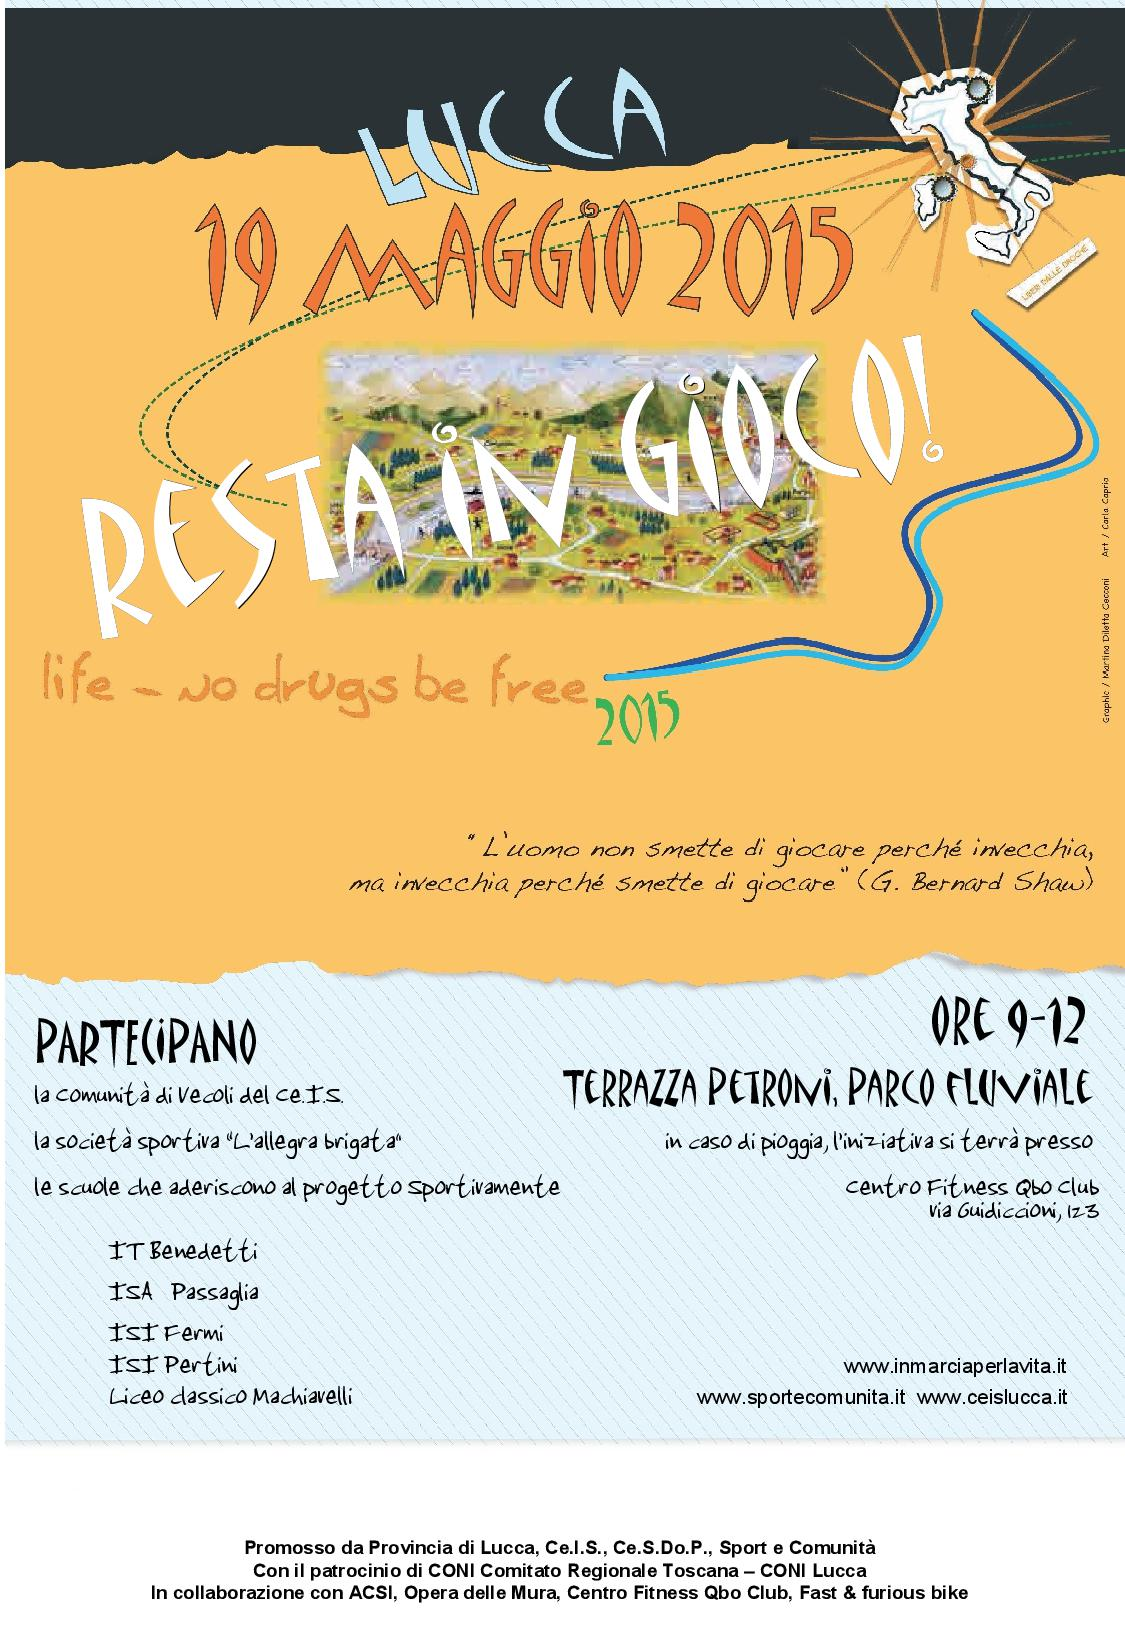 Toscana 2015 – Resta In Gioco!